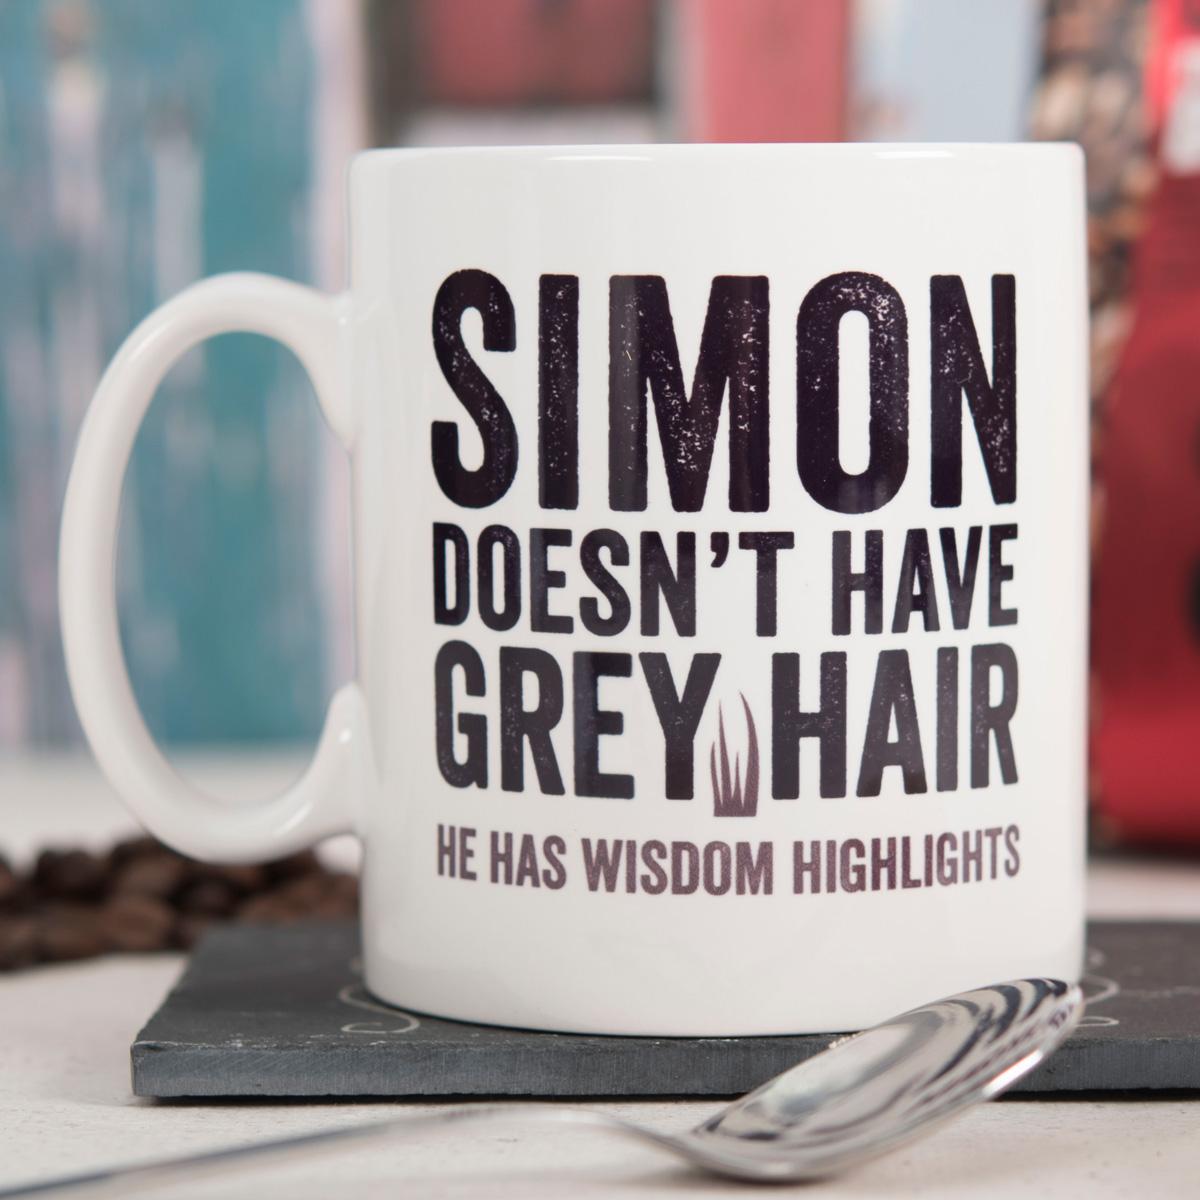 Personalised Mug - I have Wisdom Highlights